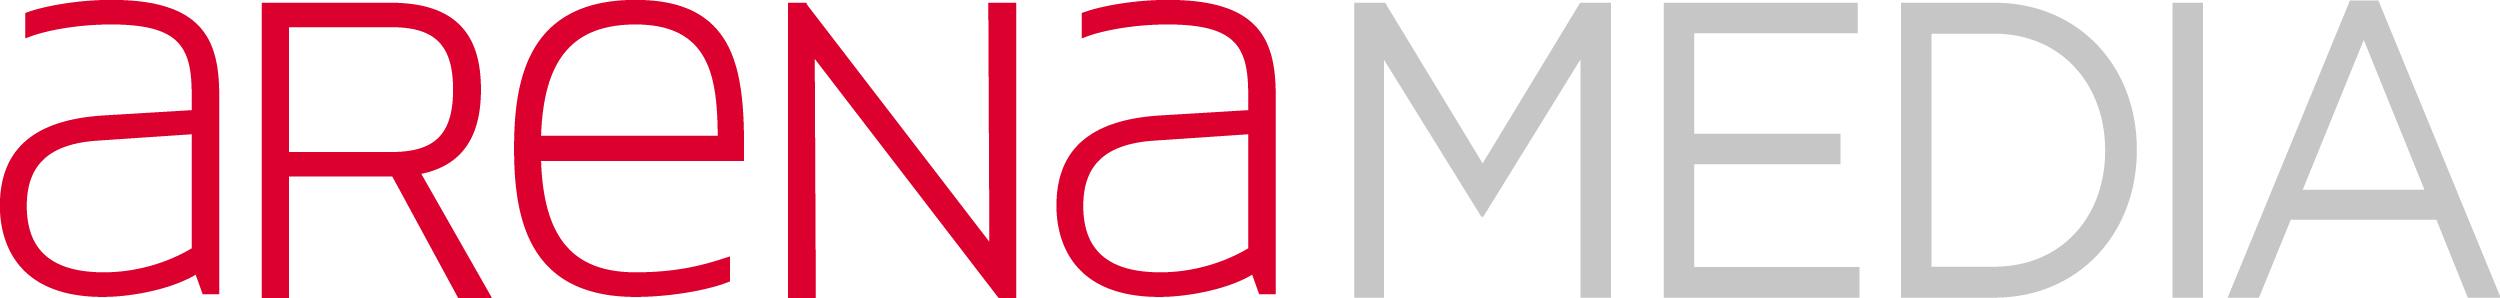 Arena Media GmbH